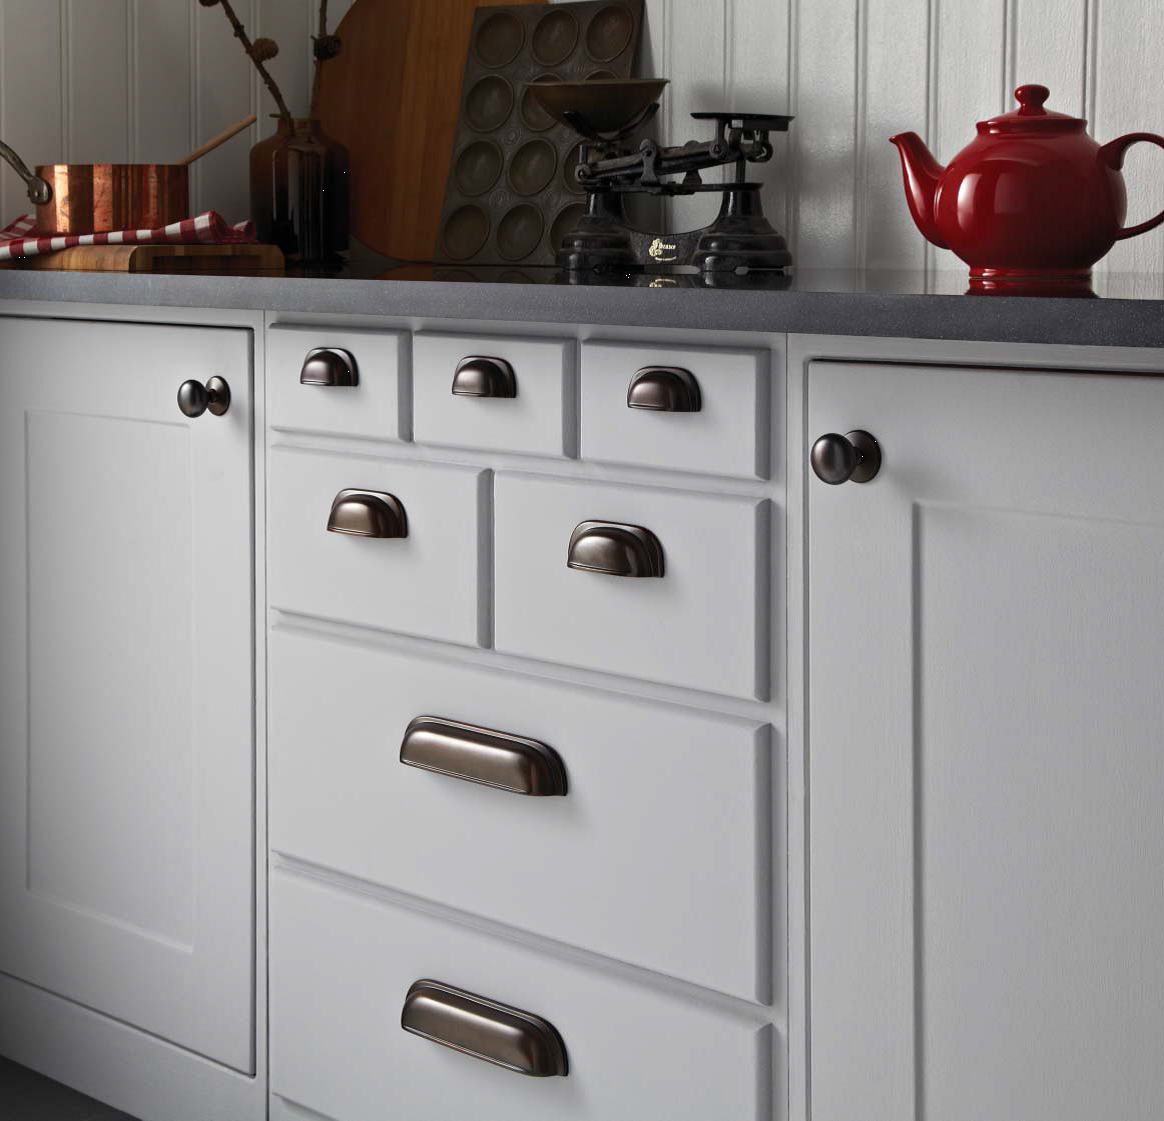 kitchen cabinets door knobs photo - 6